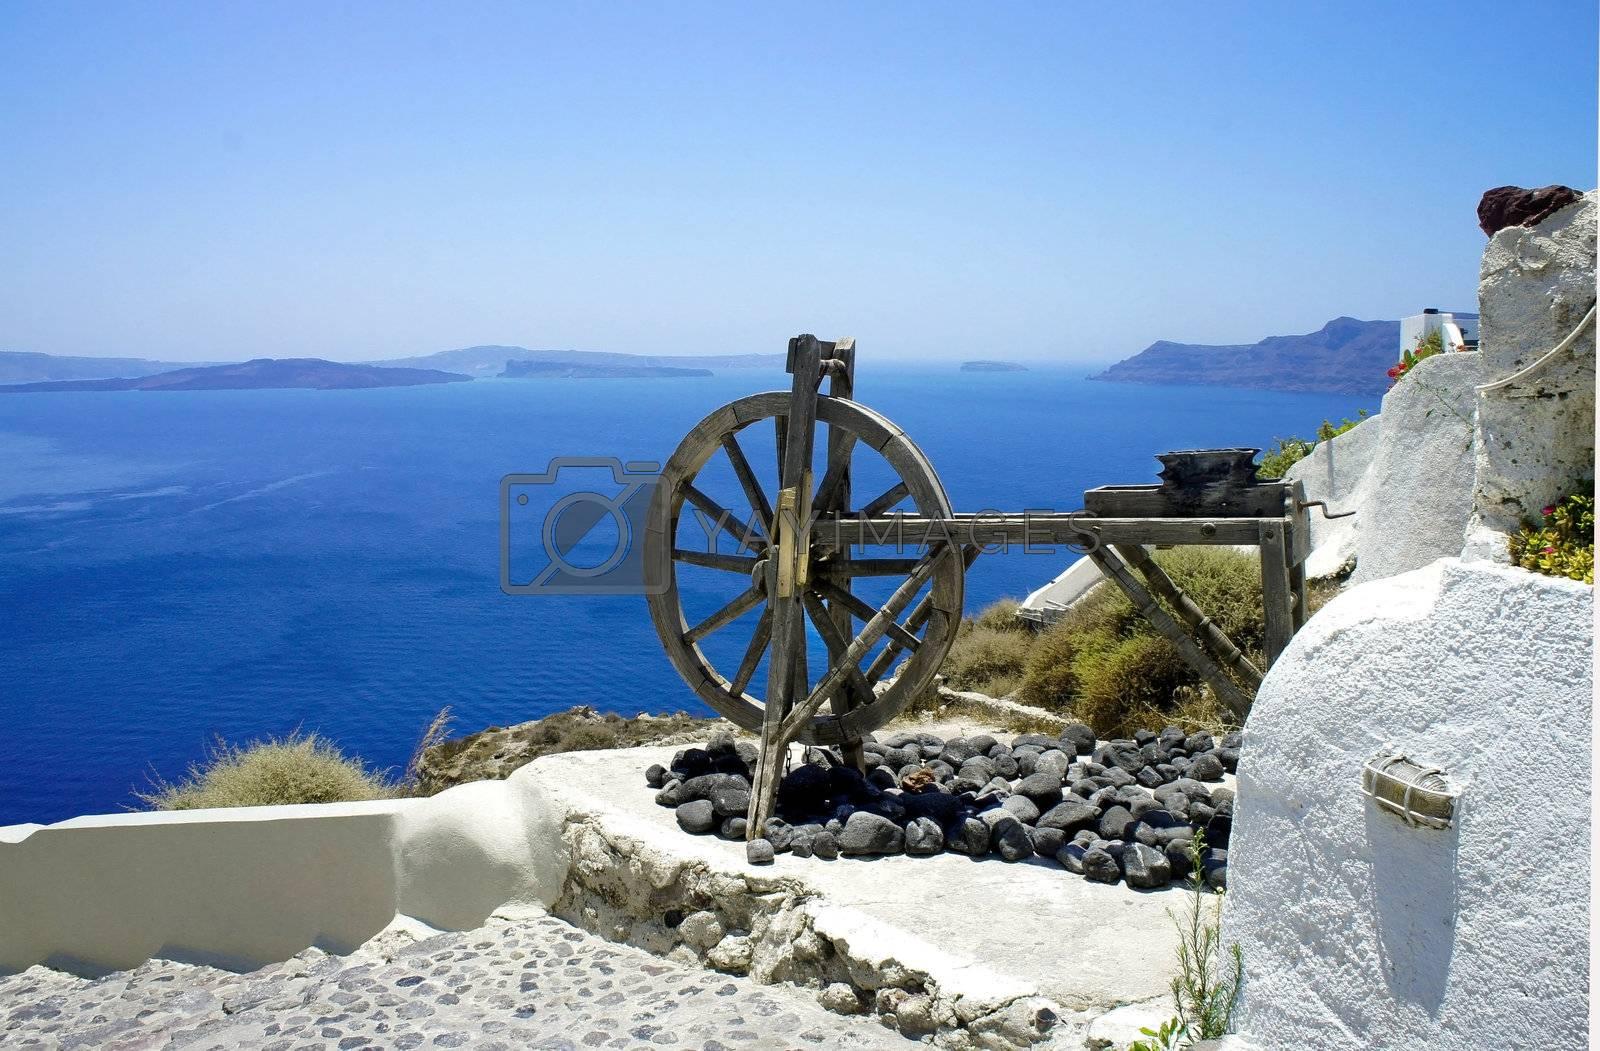 Santorini views